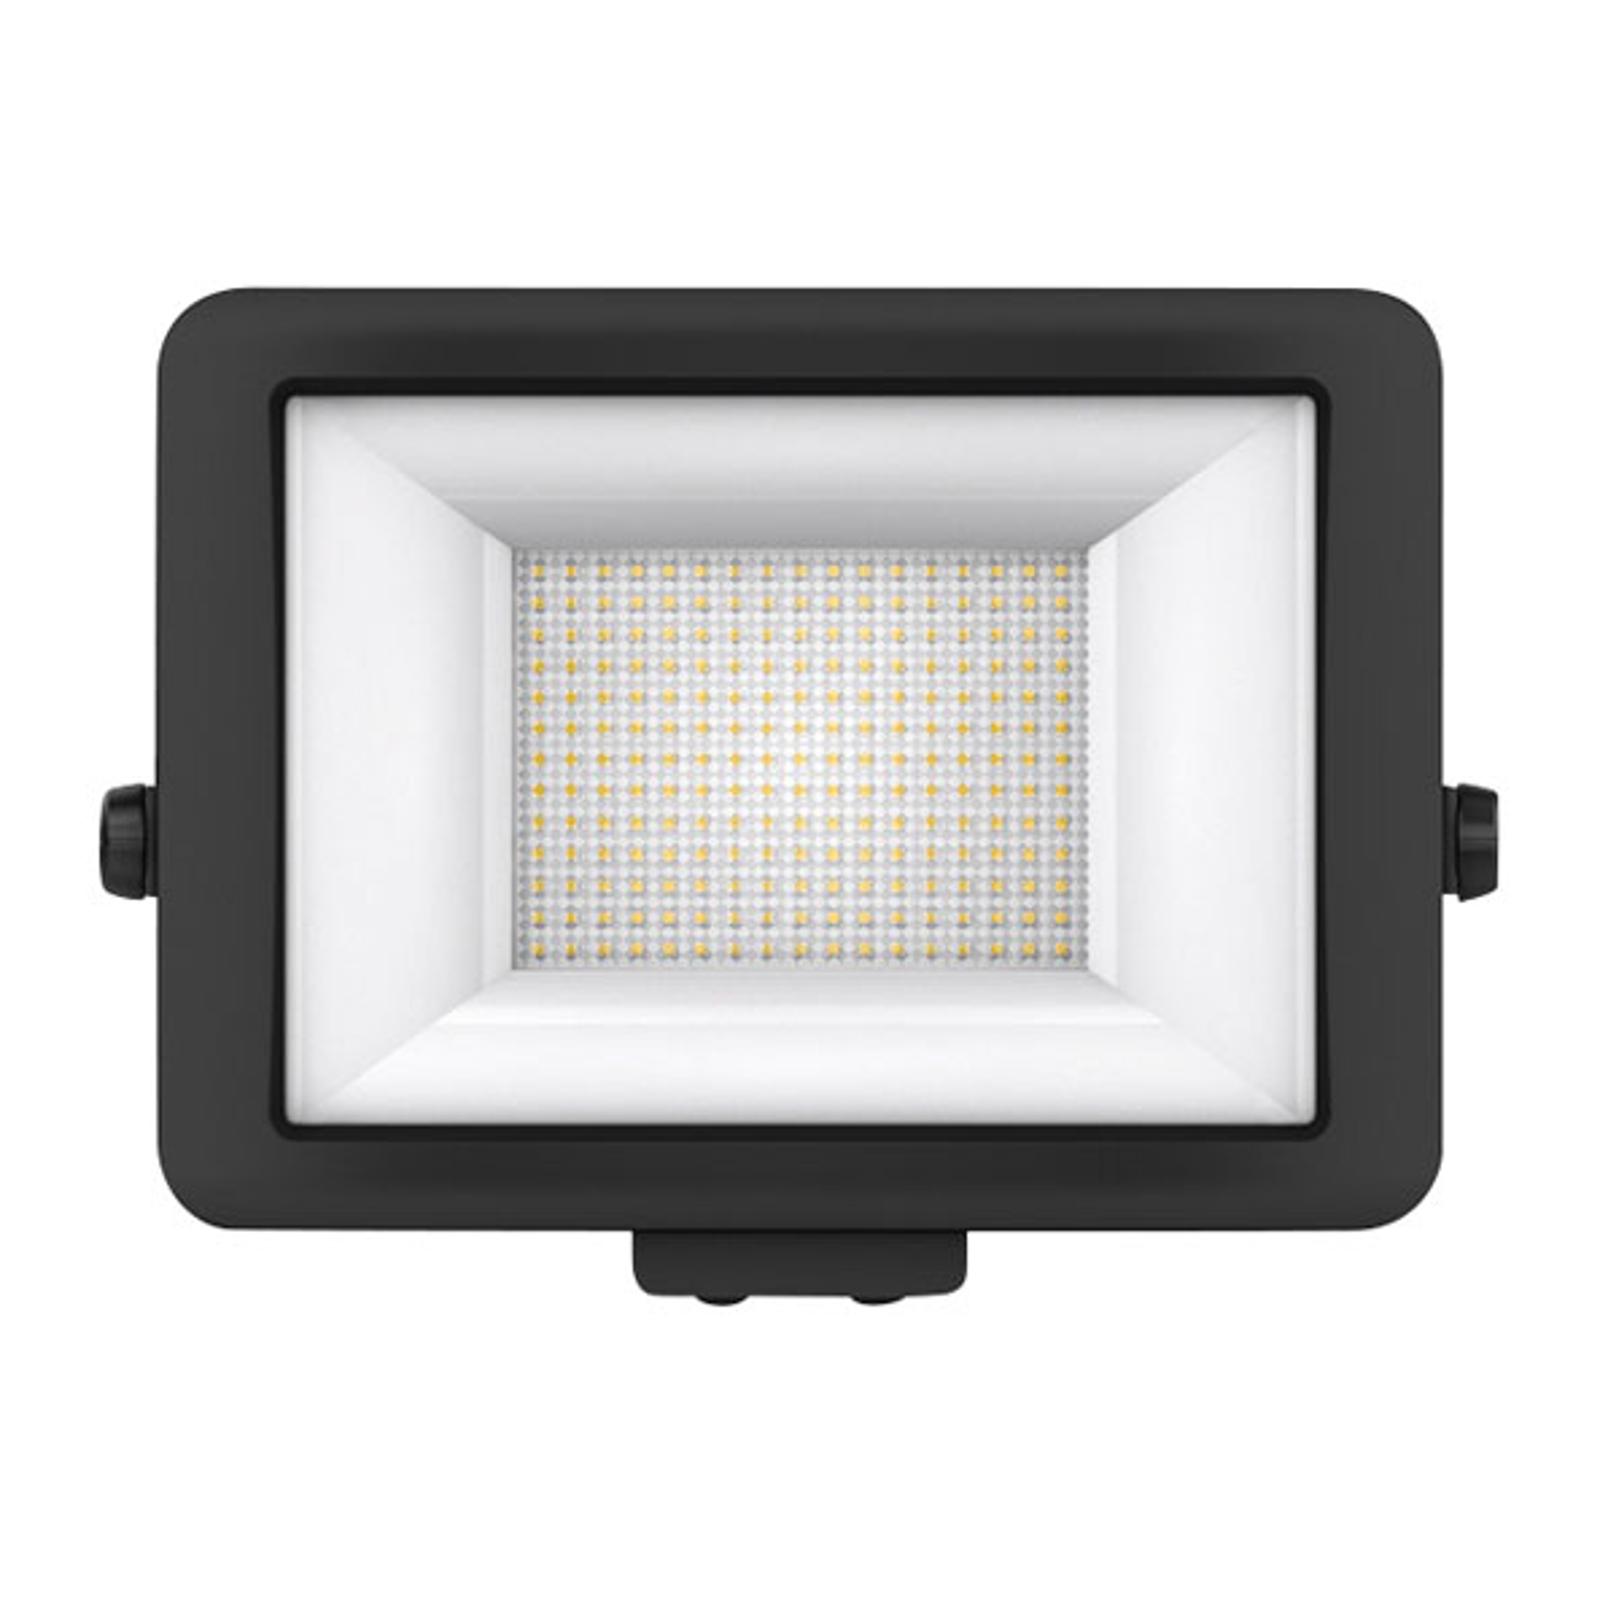 Theben theLeda B100L LED-kohdevalaisin ulos musta